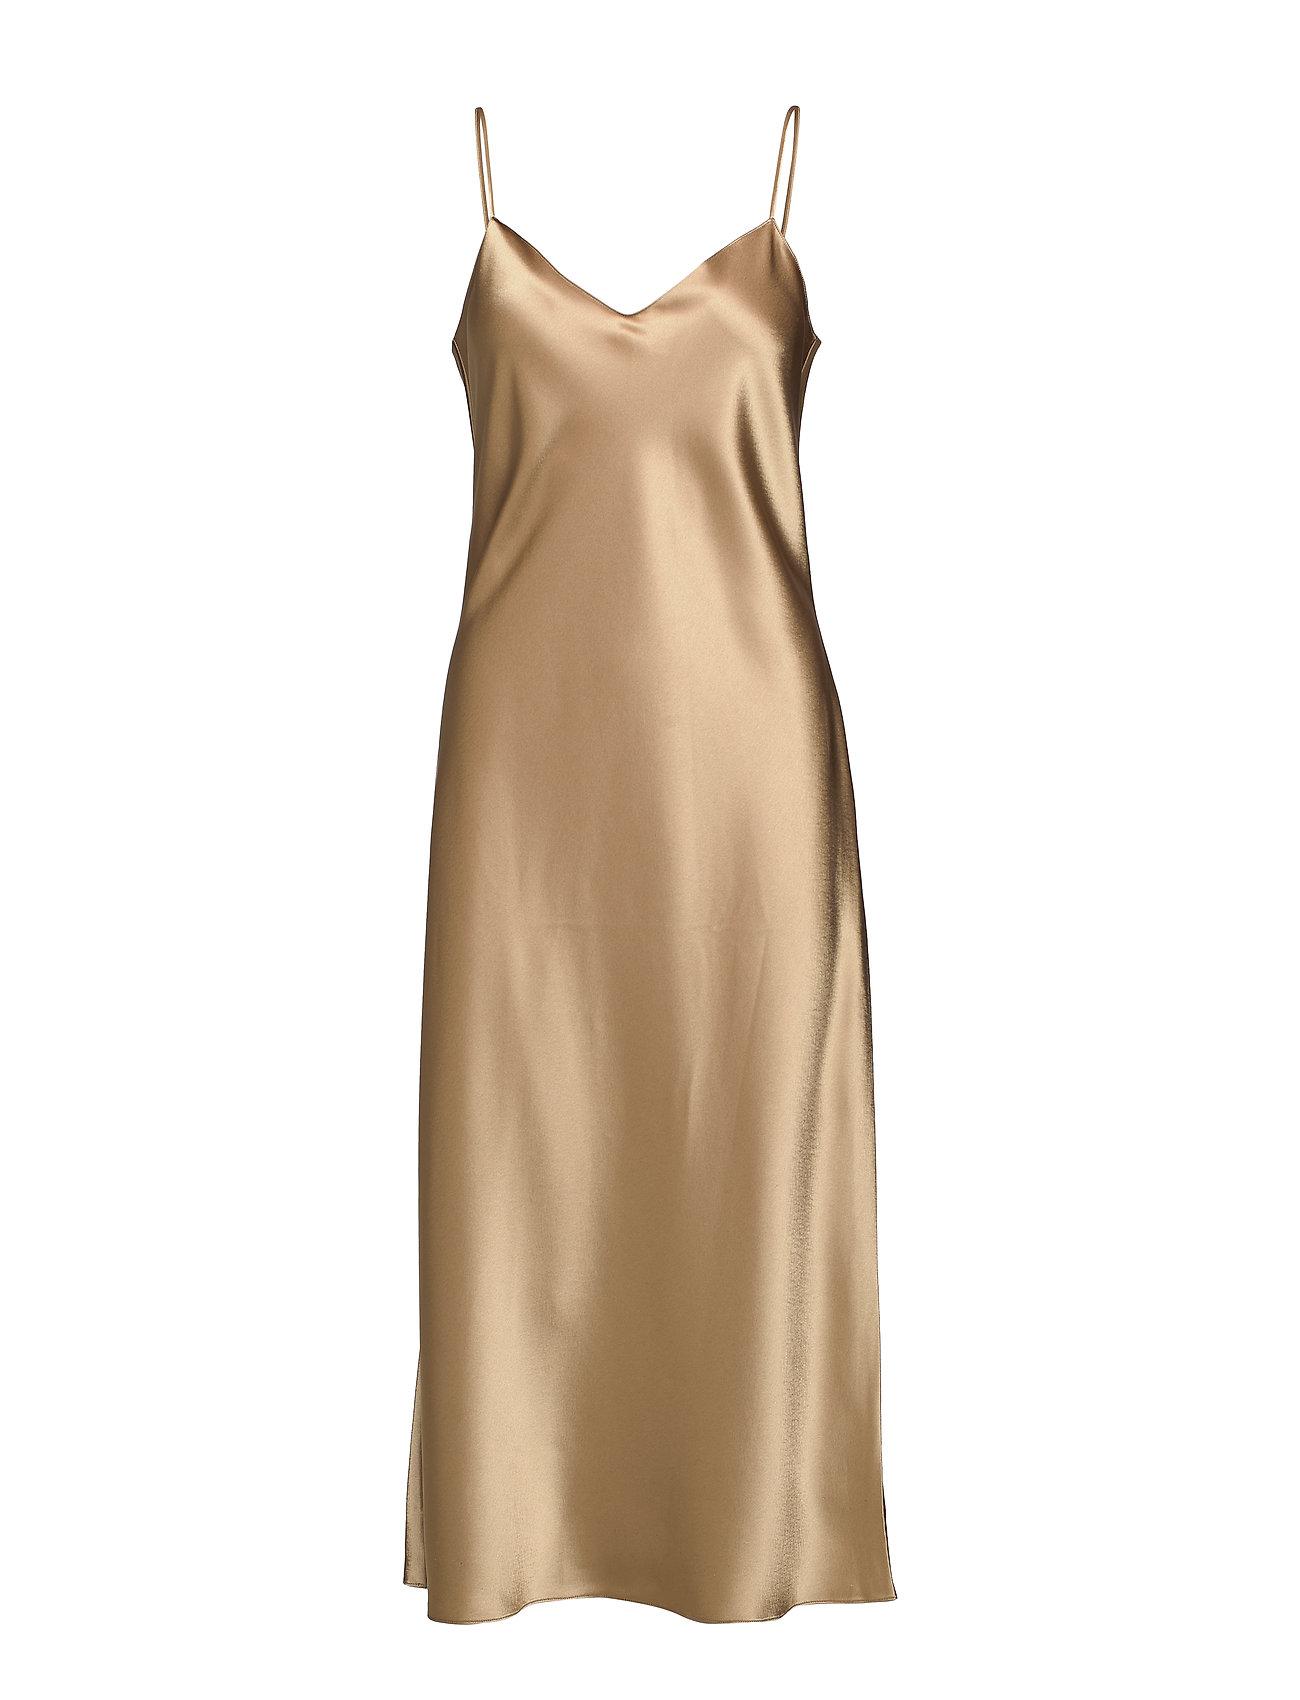 Polo Ralph Lauren Satin Slip Dress - MONTANA KHAKI